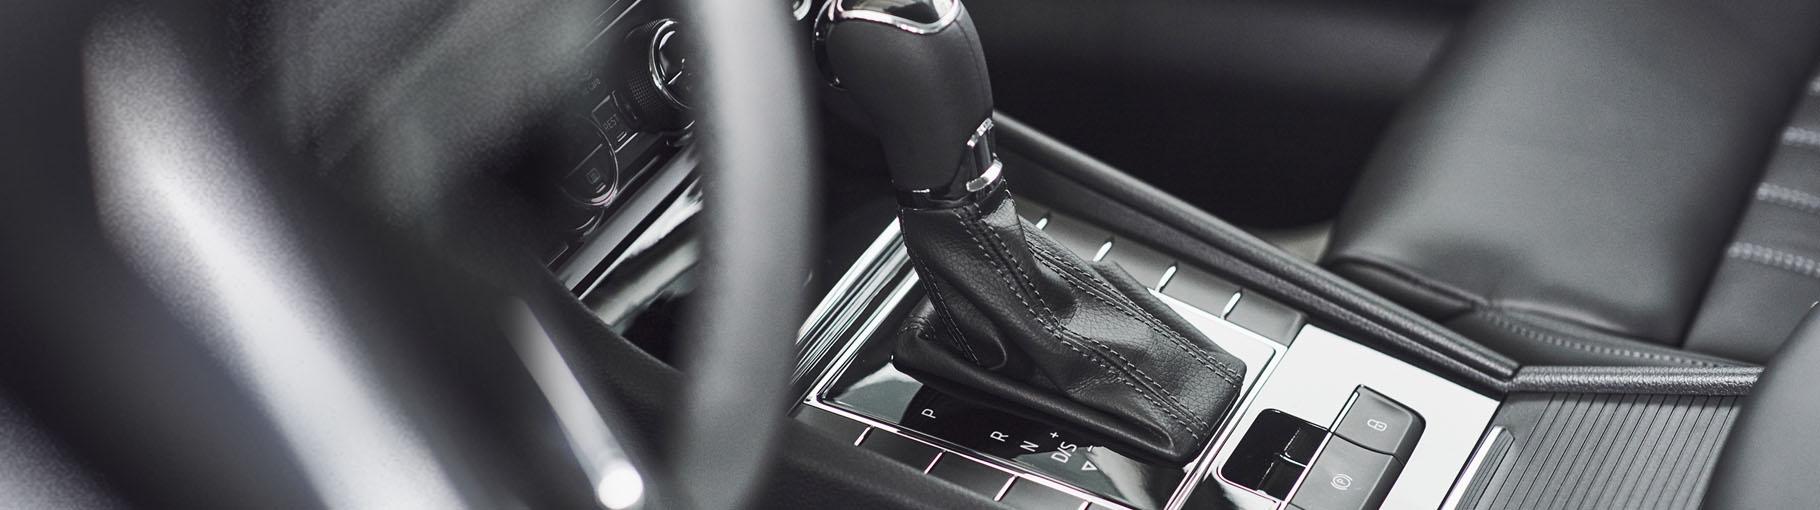 bg-carro-automatico-free